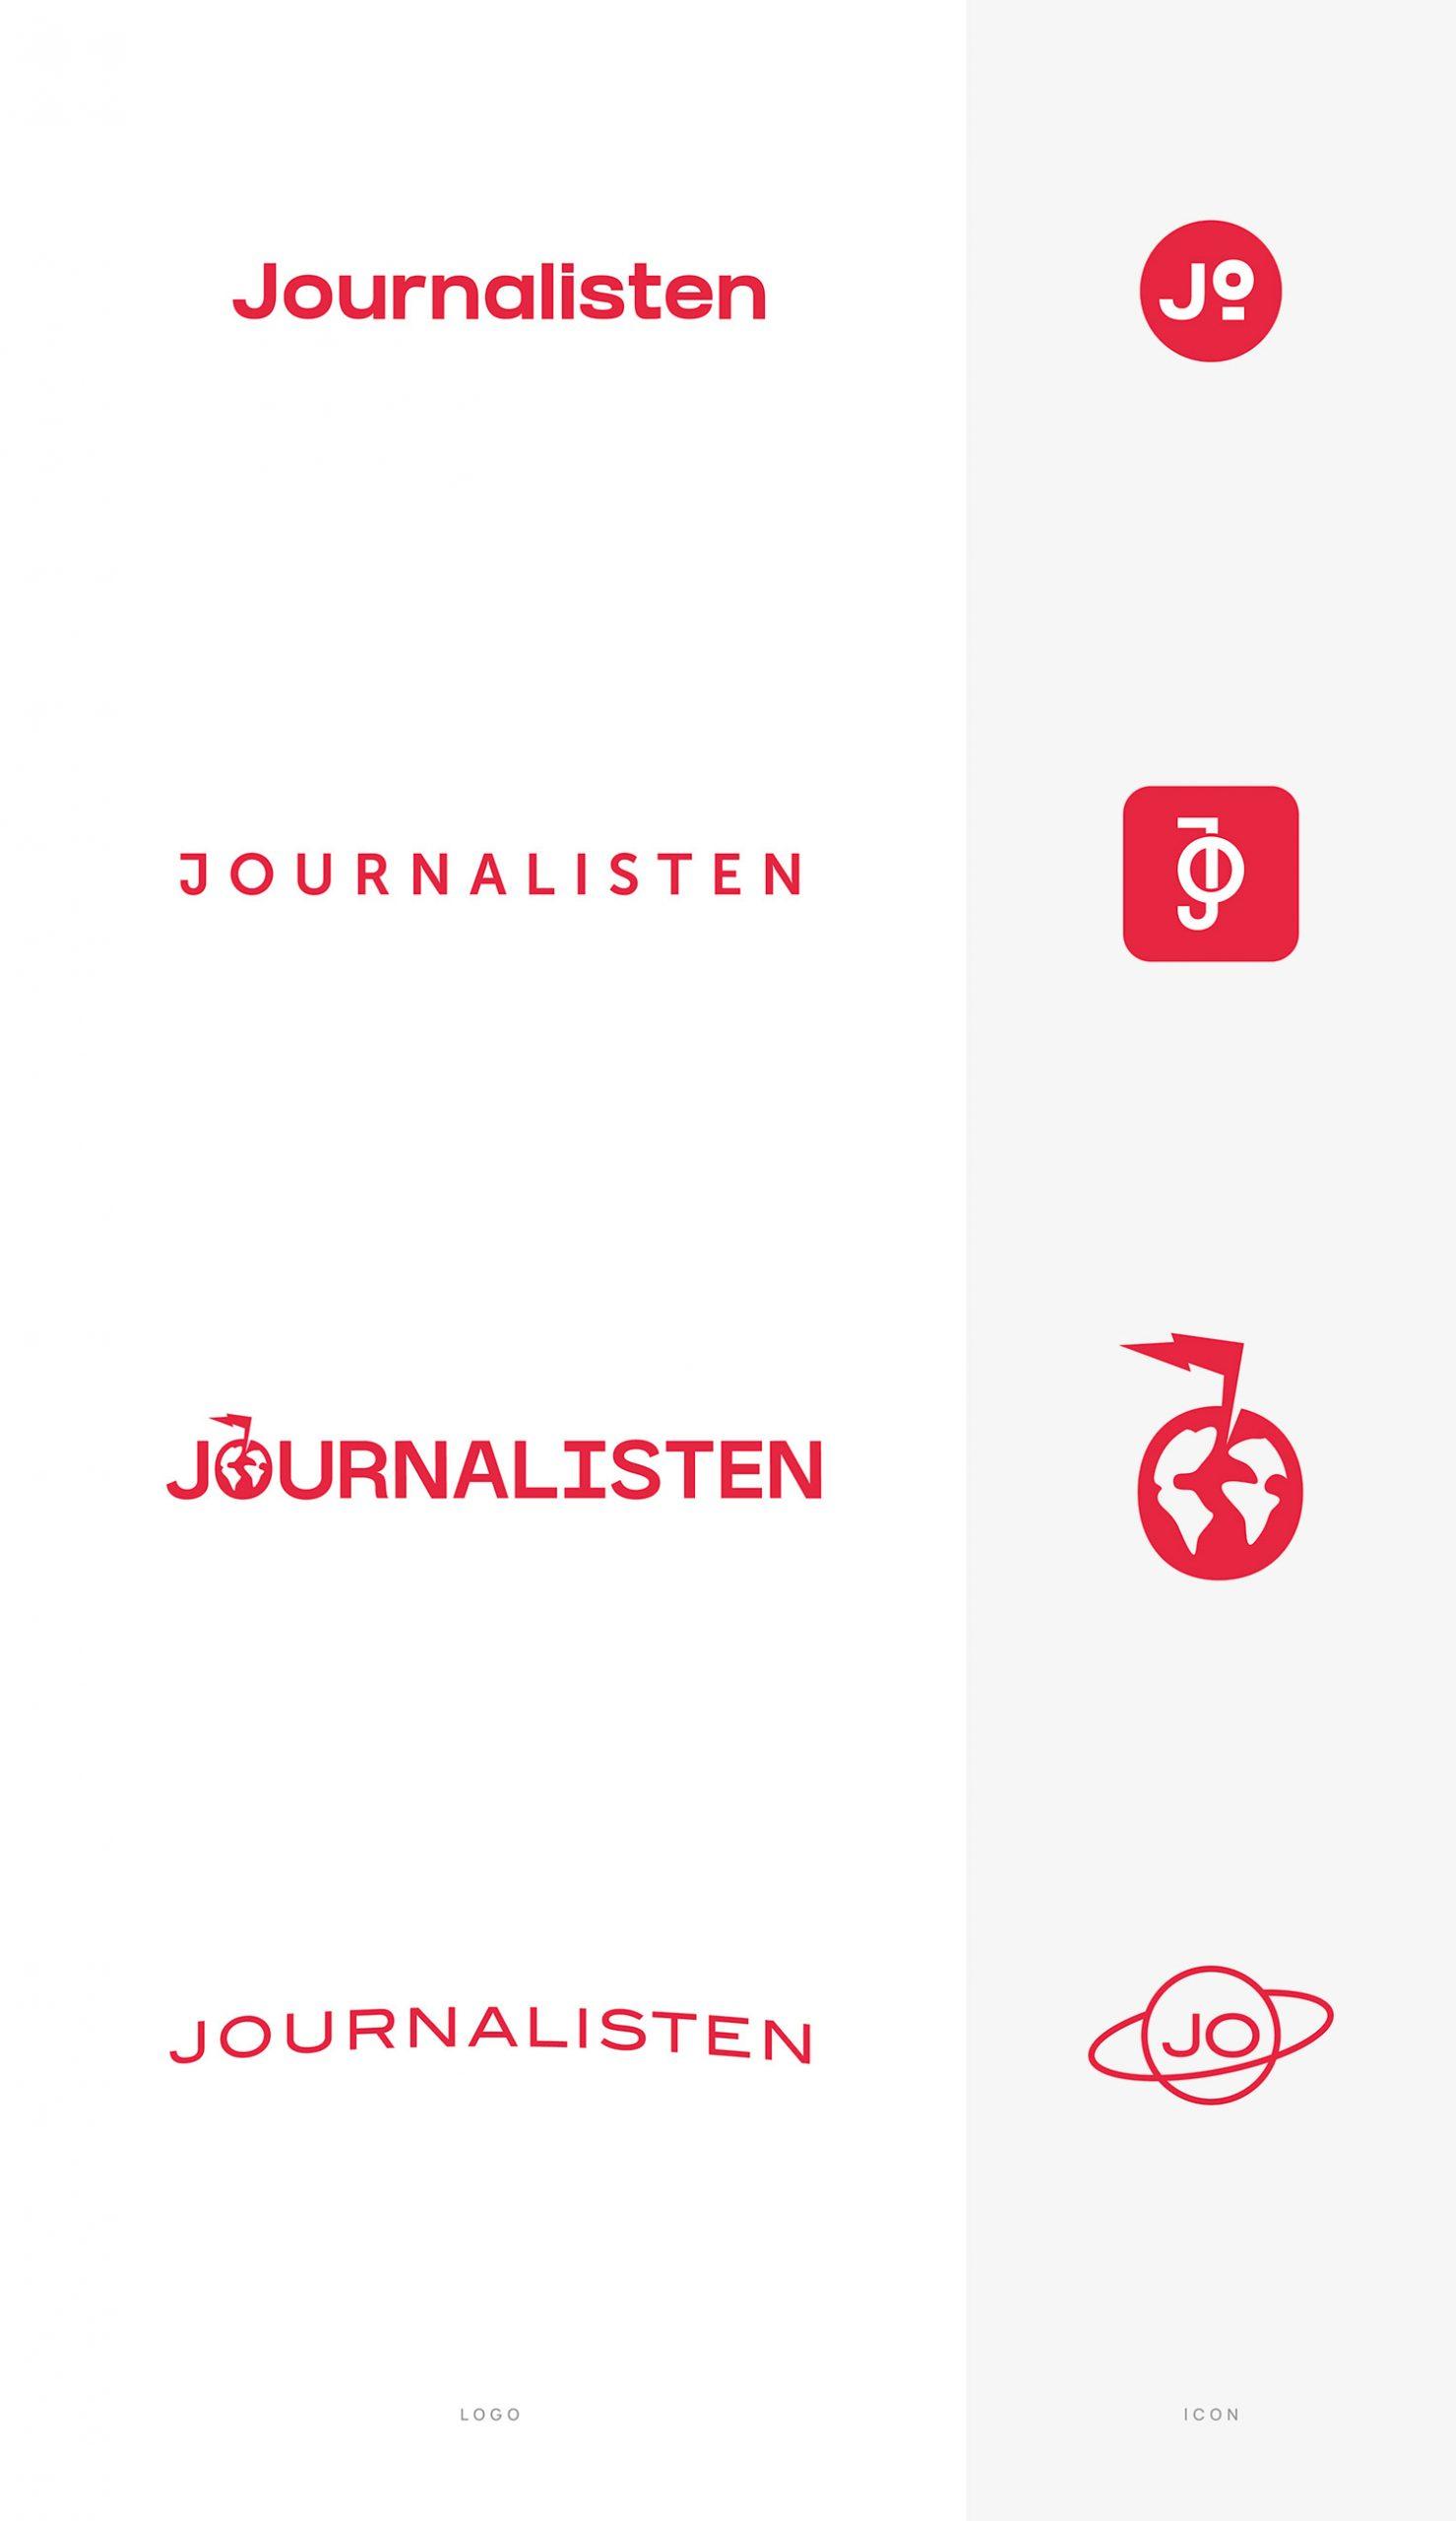 Journalistens logo redesignet på tre kontinenter – her er resultaterne 3